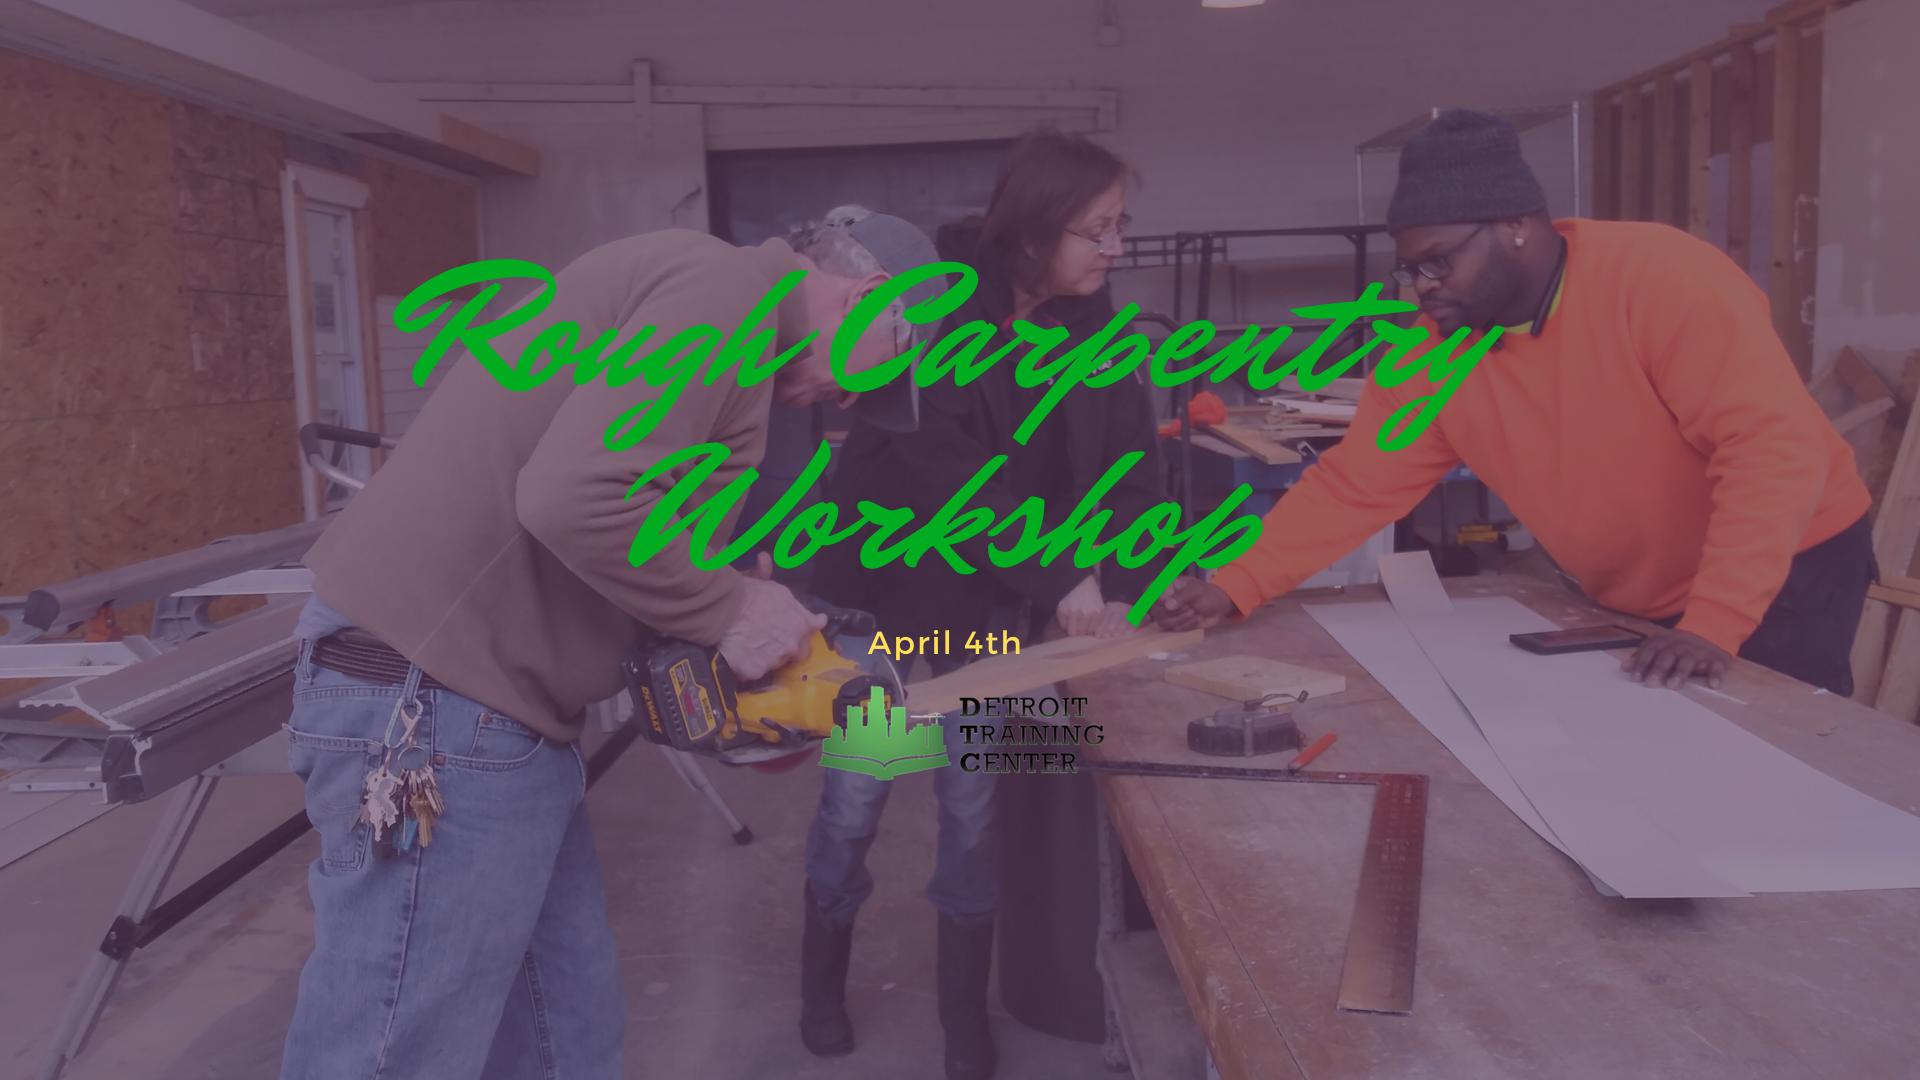 Rough Carpentry Basic Workshop